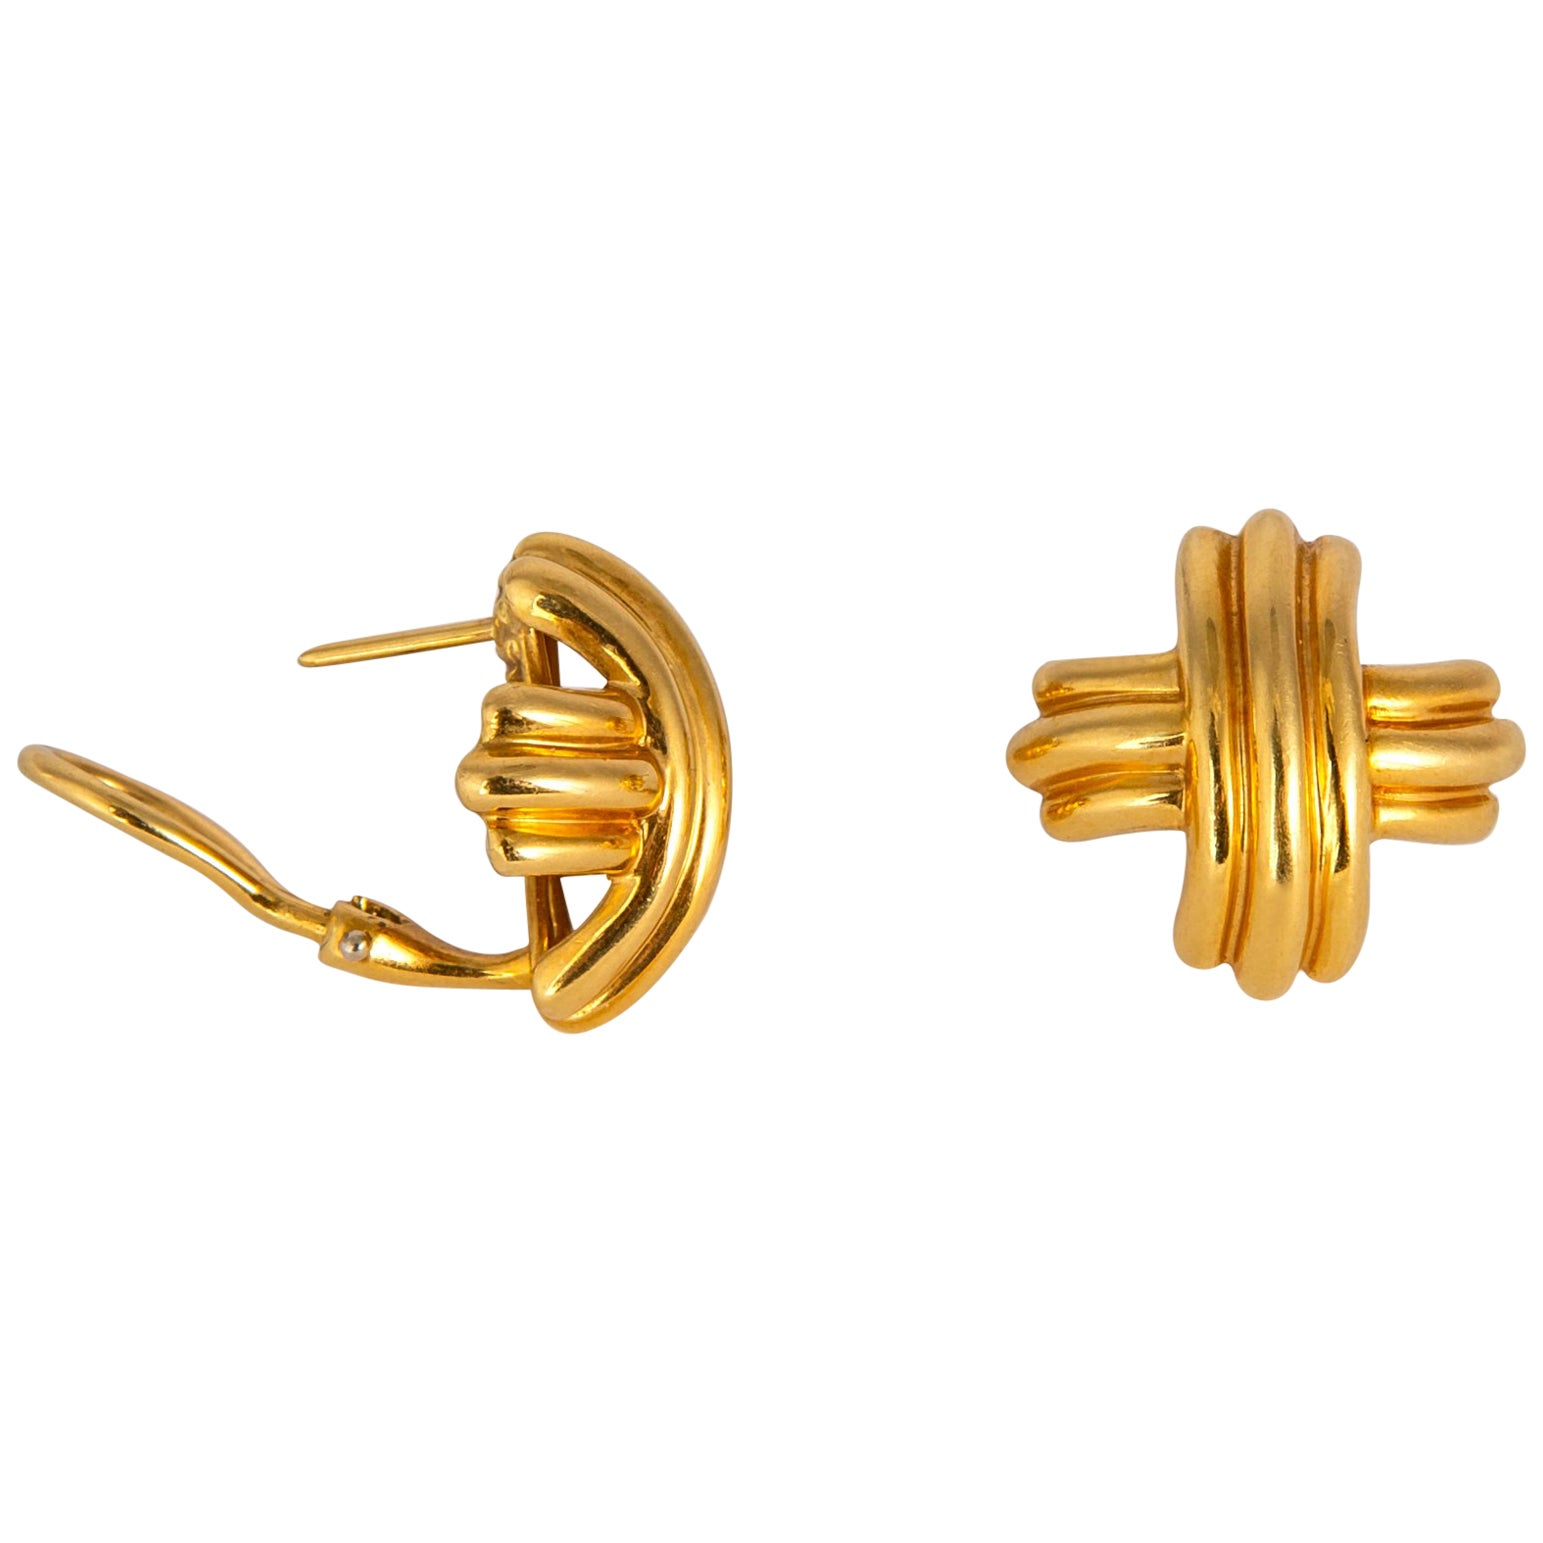 Iconic Tiffany & Co. Criss Cross Earrings